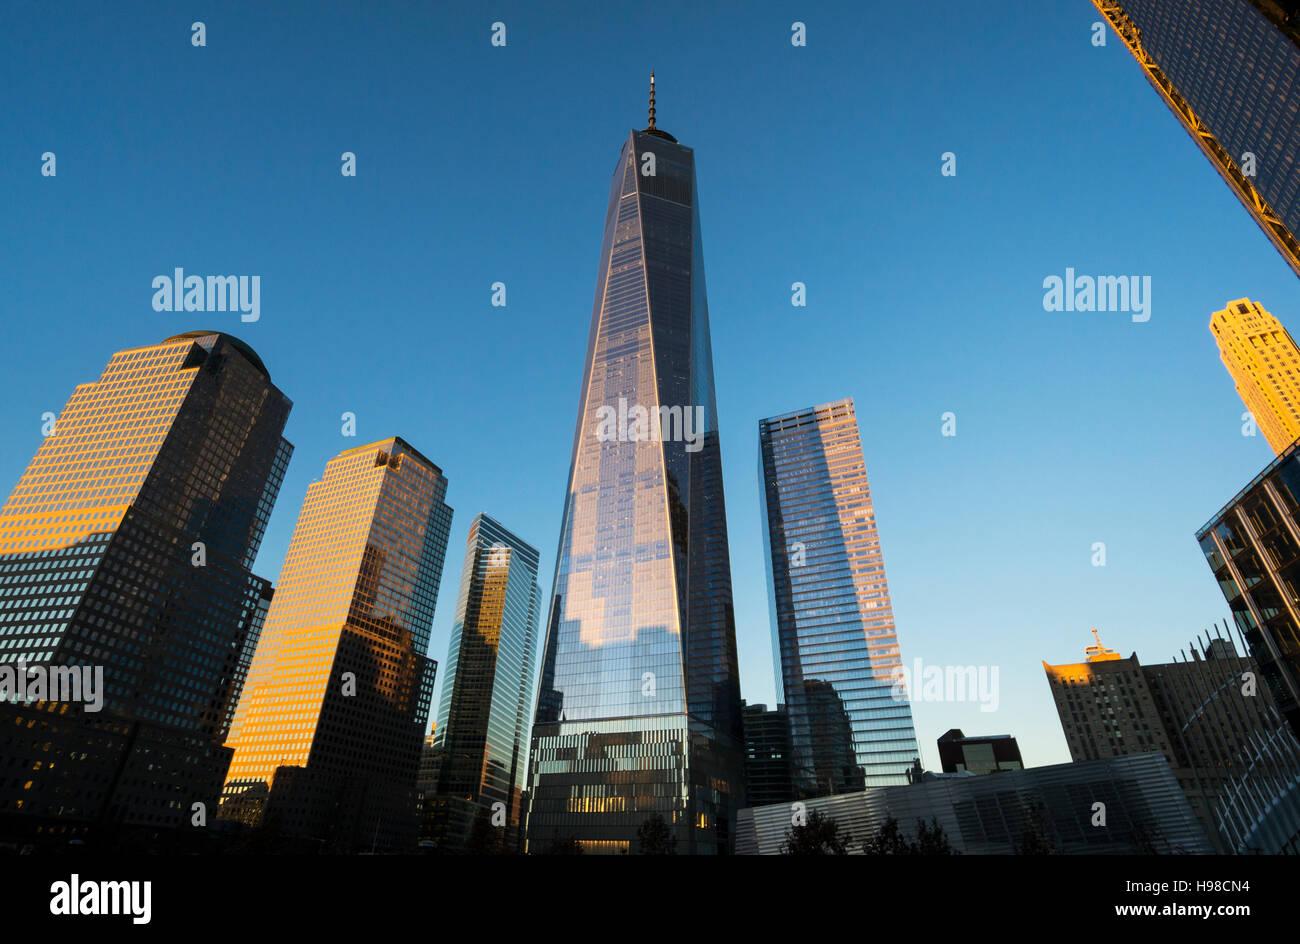 freedom-tower-one-world-trade-center-sky